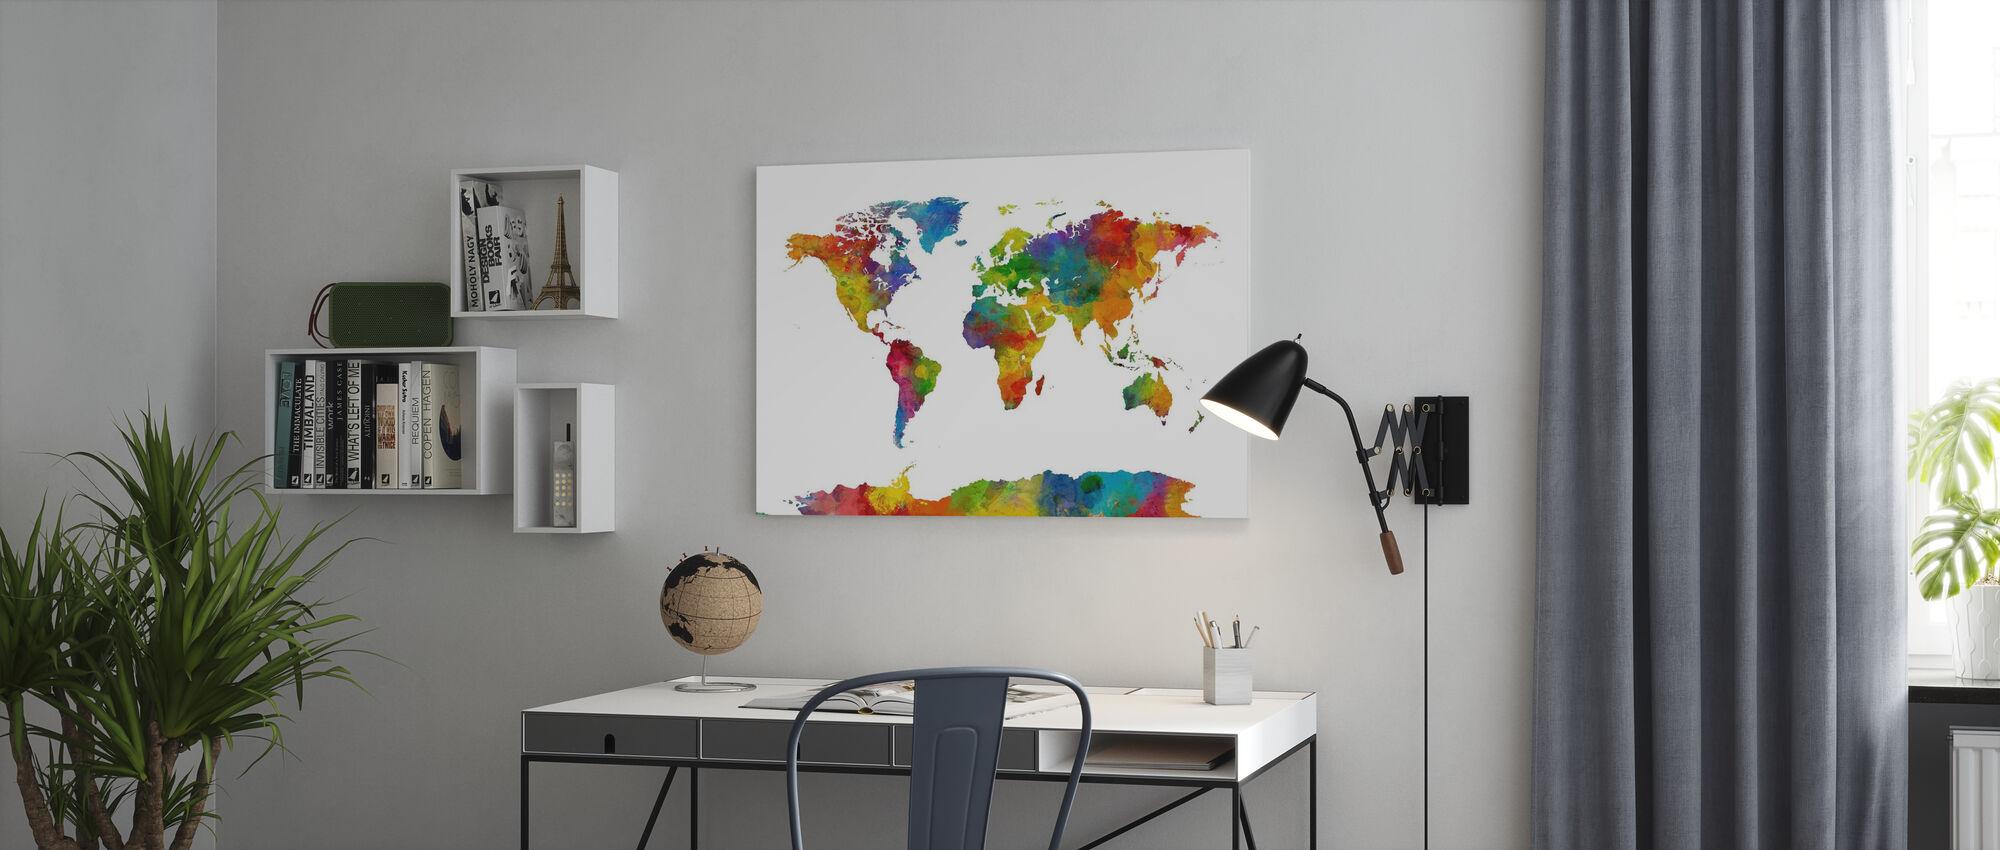 Watercolor World Map Multicolor 2 - Canvas print - Office